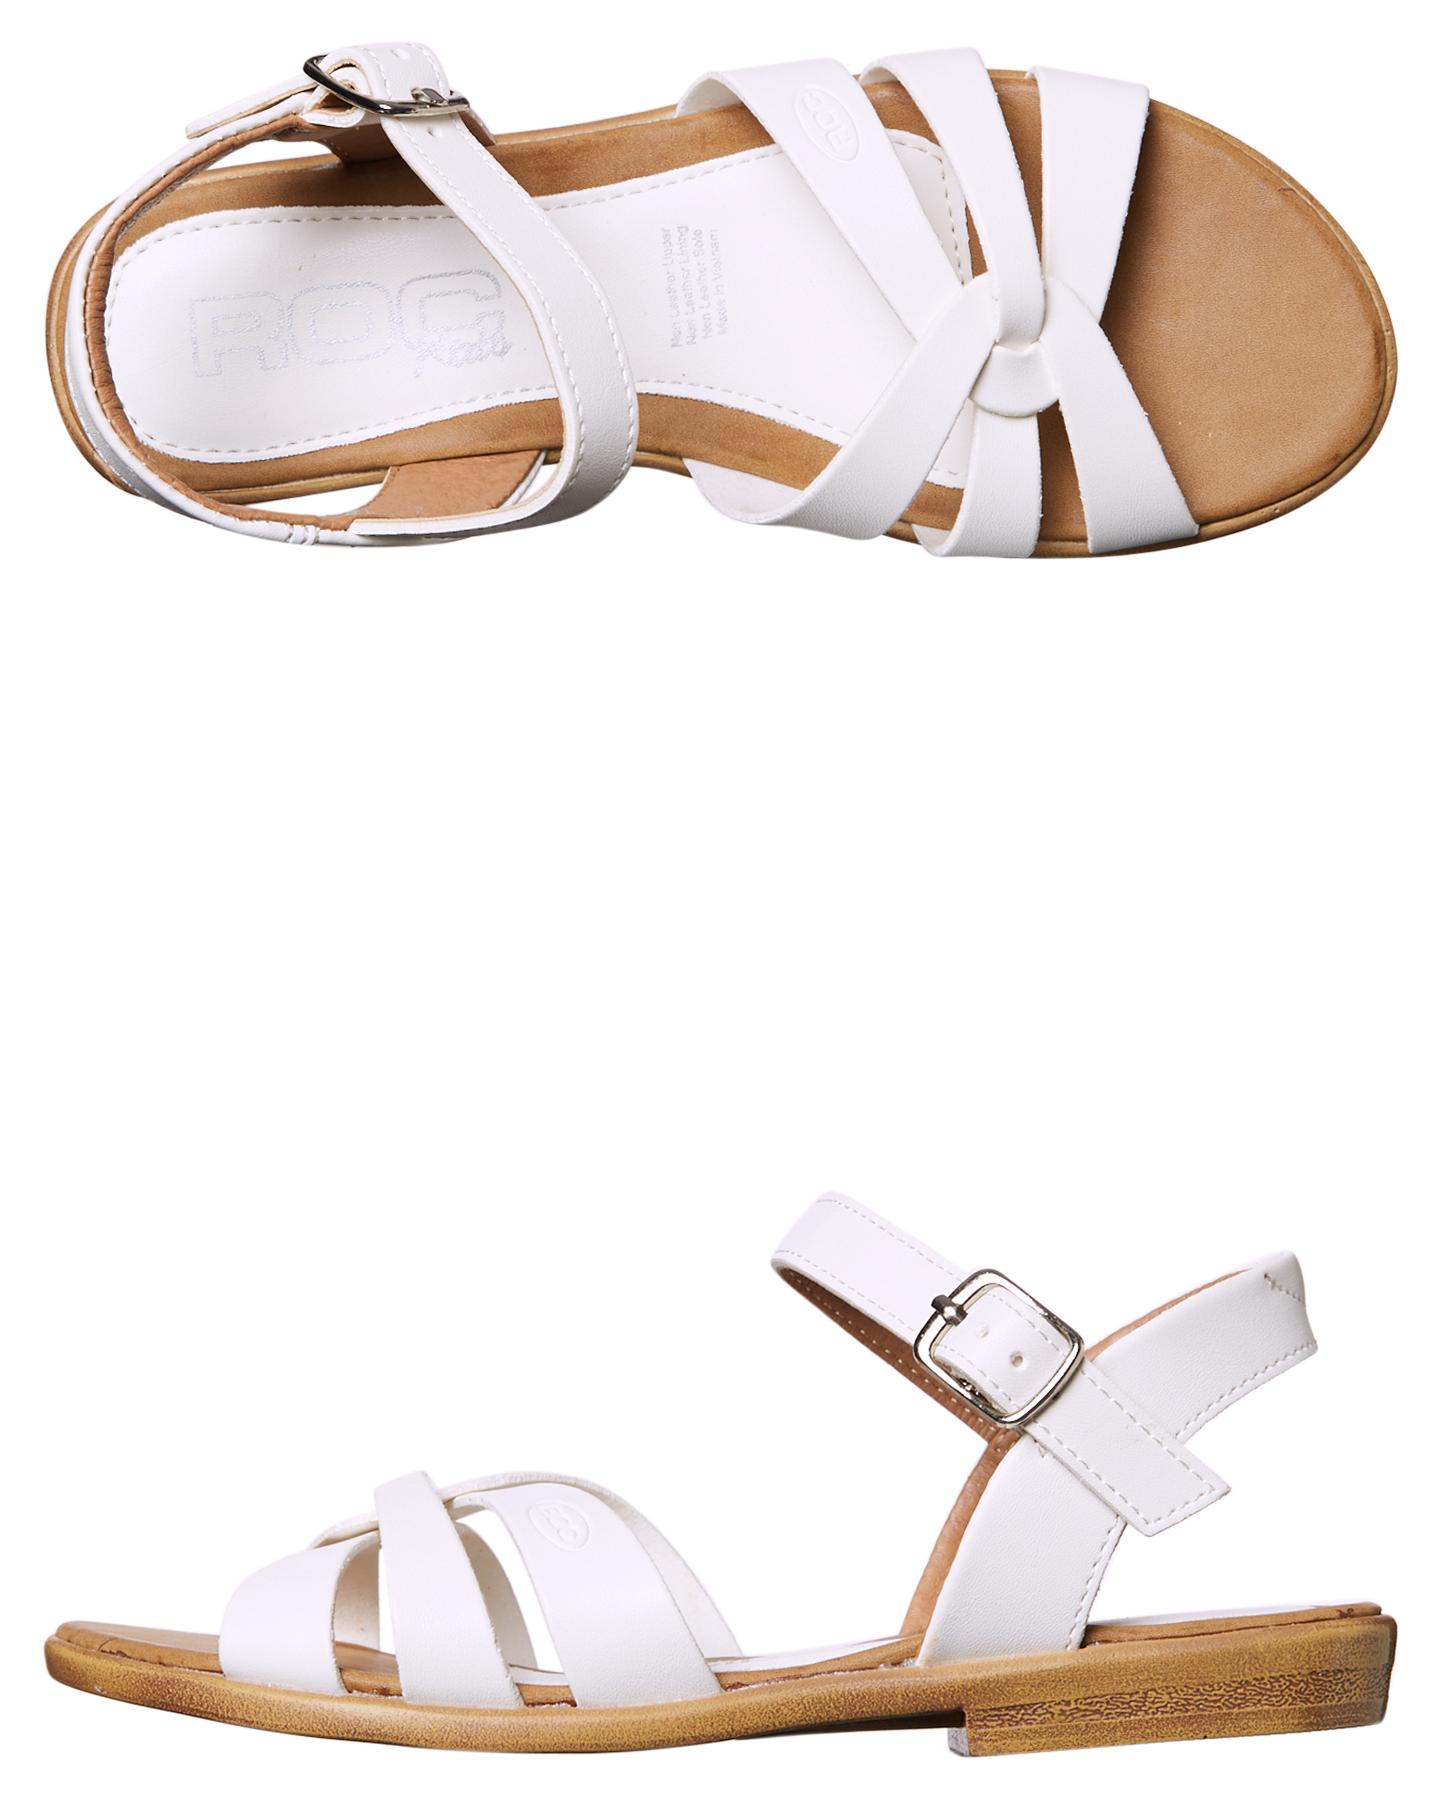 8914d5af49ed7 Roc Boots Australia Piper Girls Sandal - White | SurfStitch